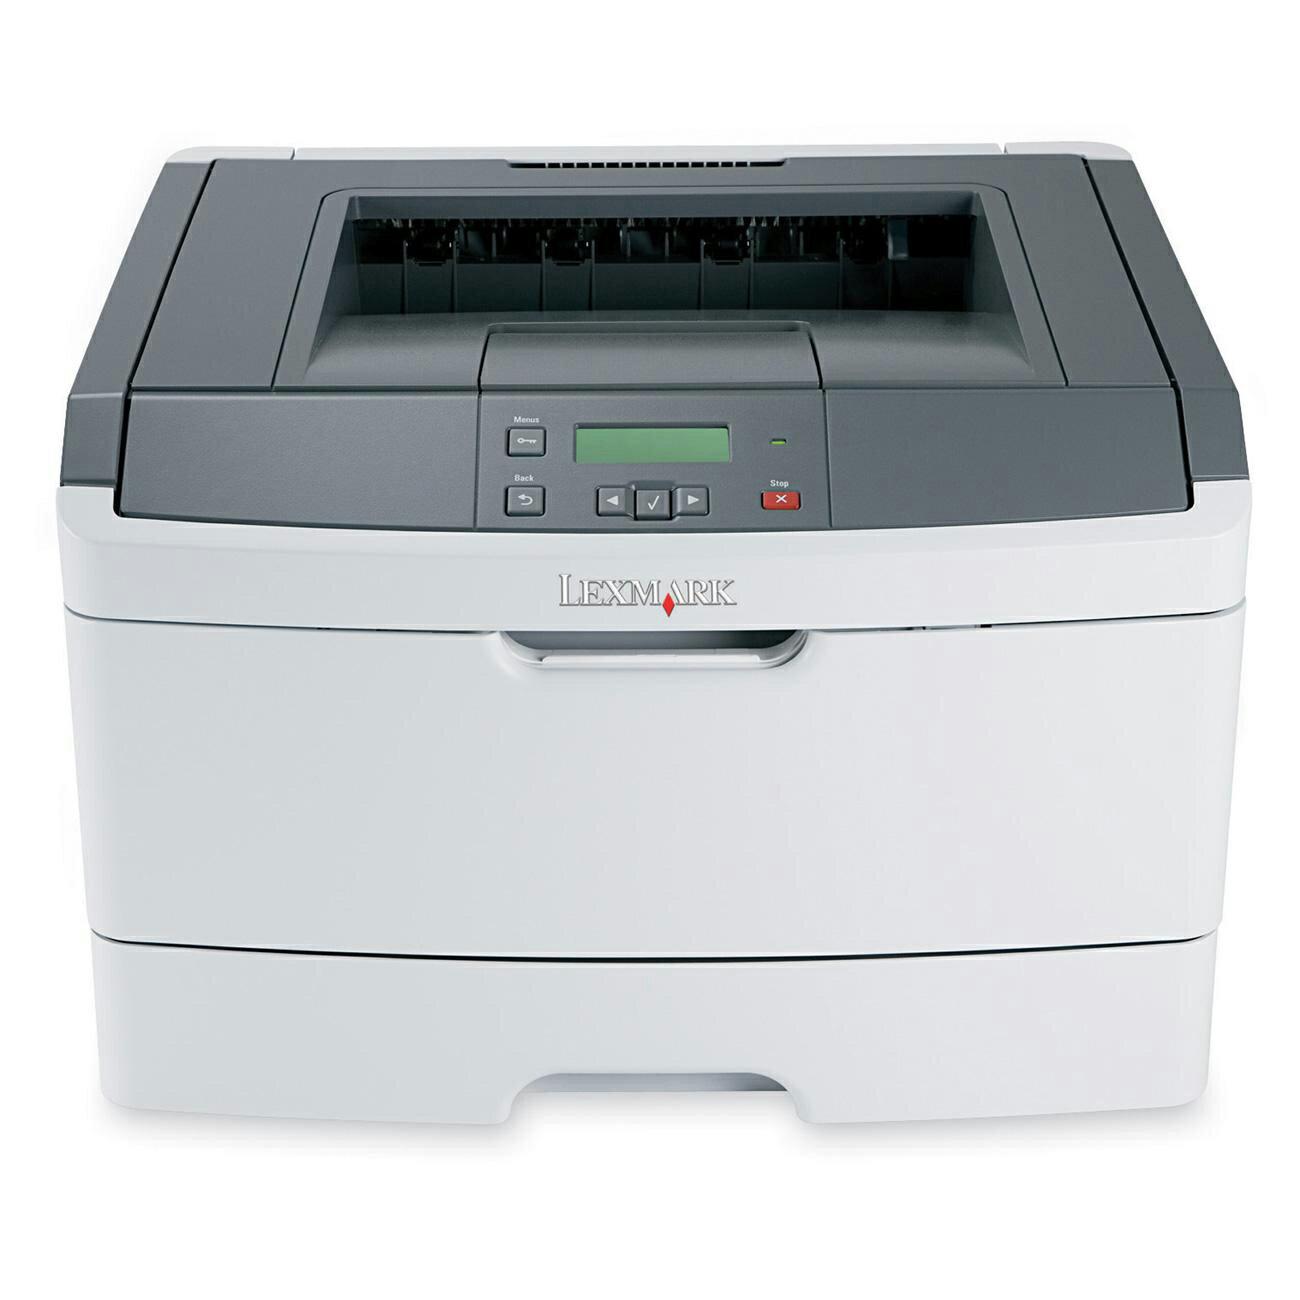 Lexmark E360DN Laser Printer with 40 ppm Monochrome, 1200 x 1200 dpi Resolution 0